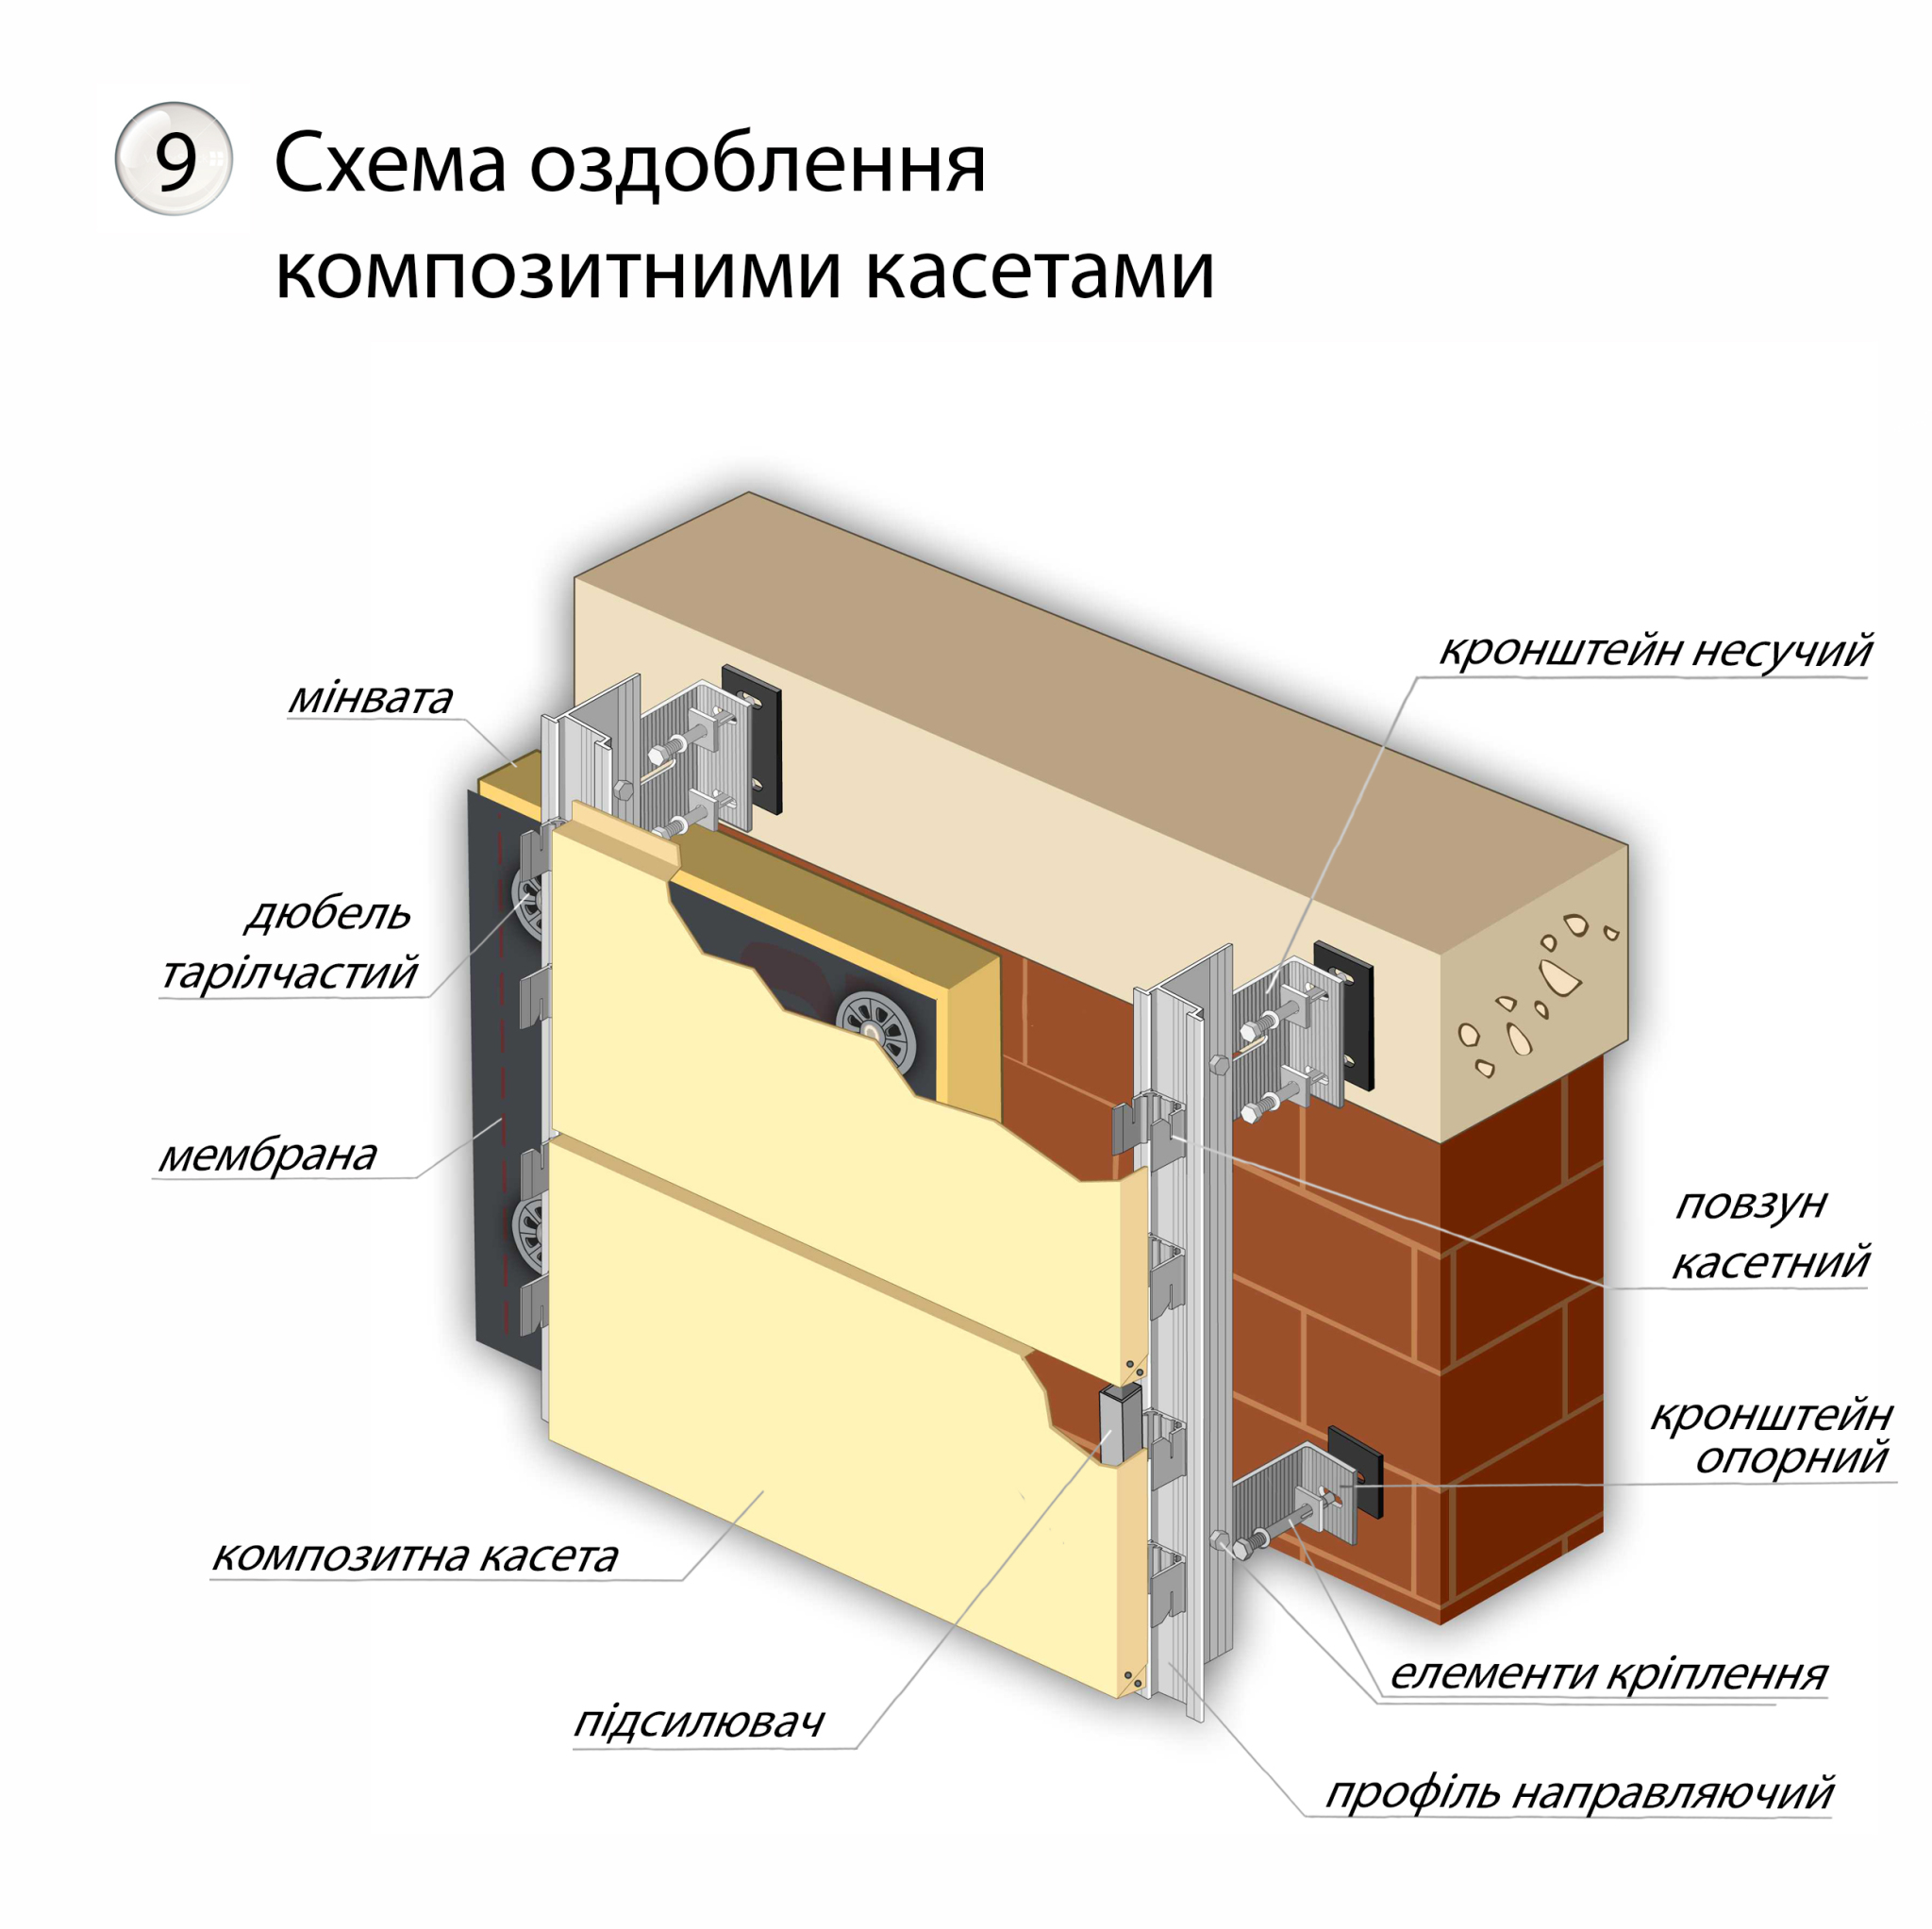 Схема оздоблення композитними касетами